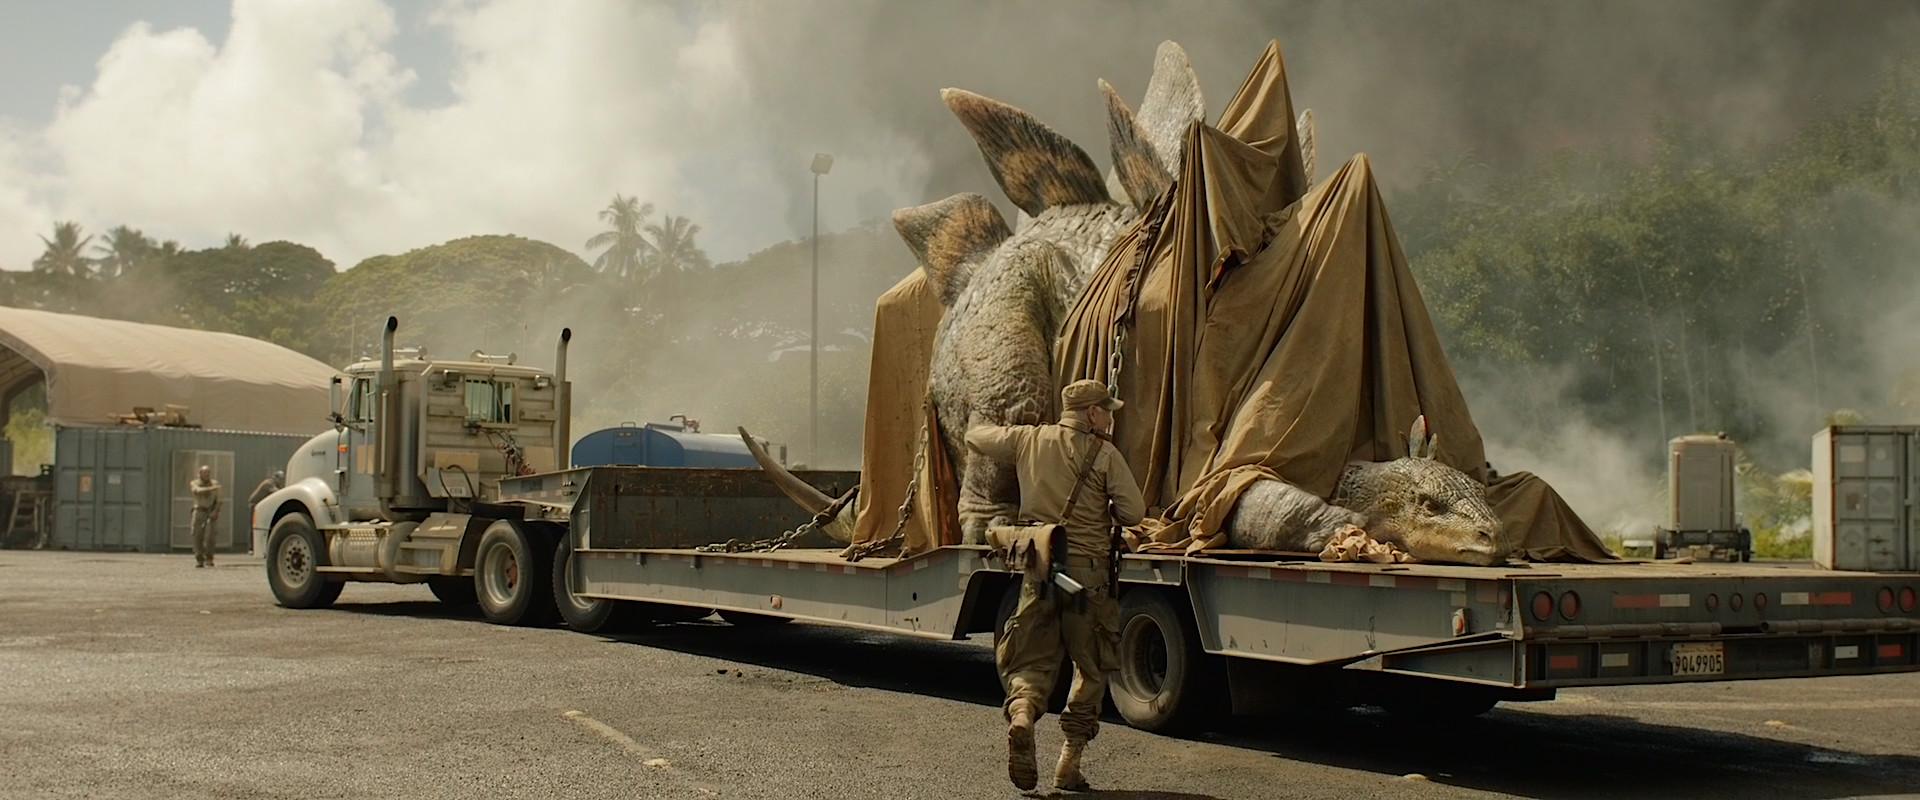 Jurassic World: Fallen Kingdom (2018) - Photo Gallery - IMDb